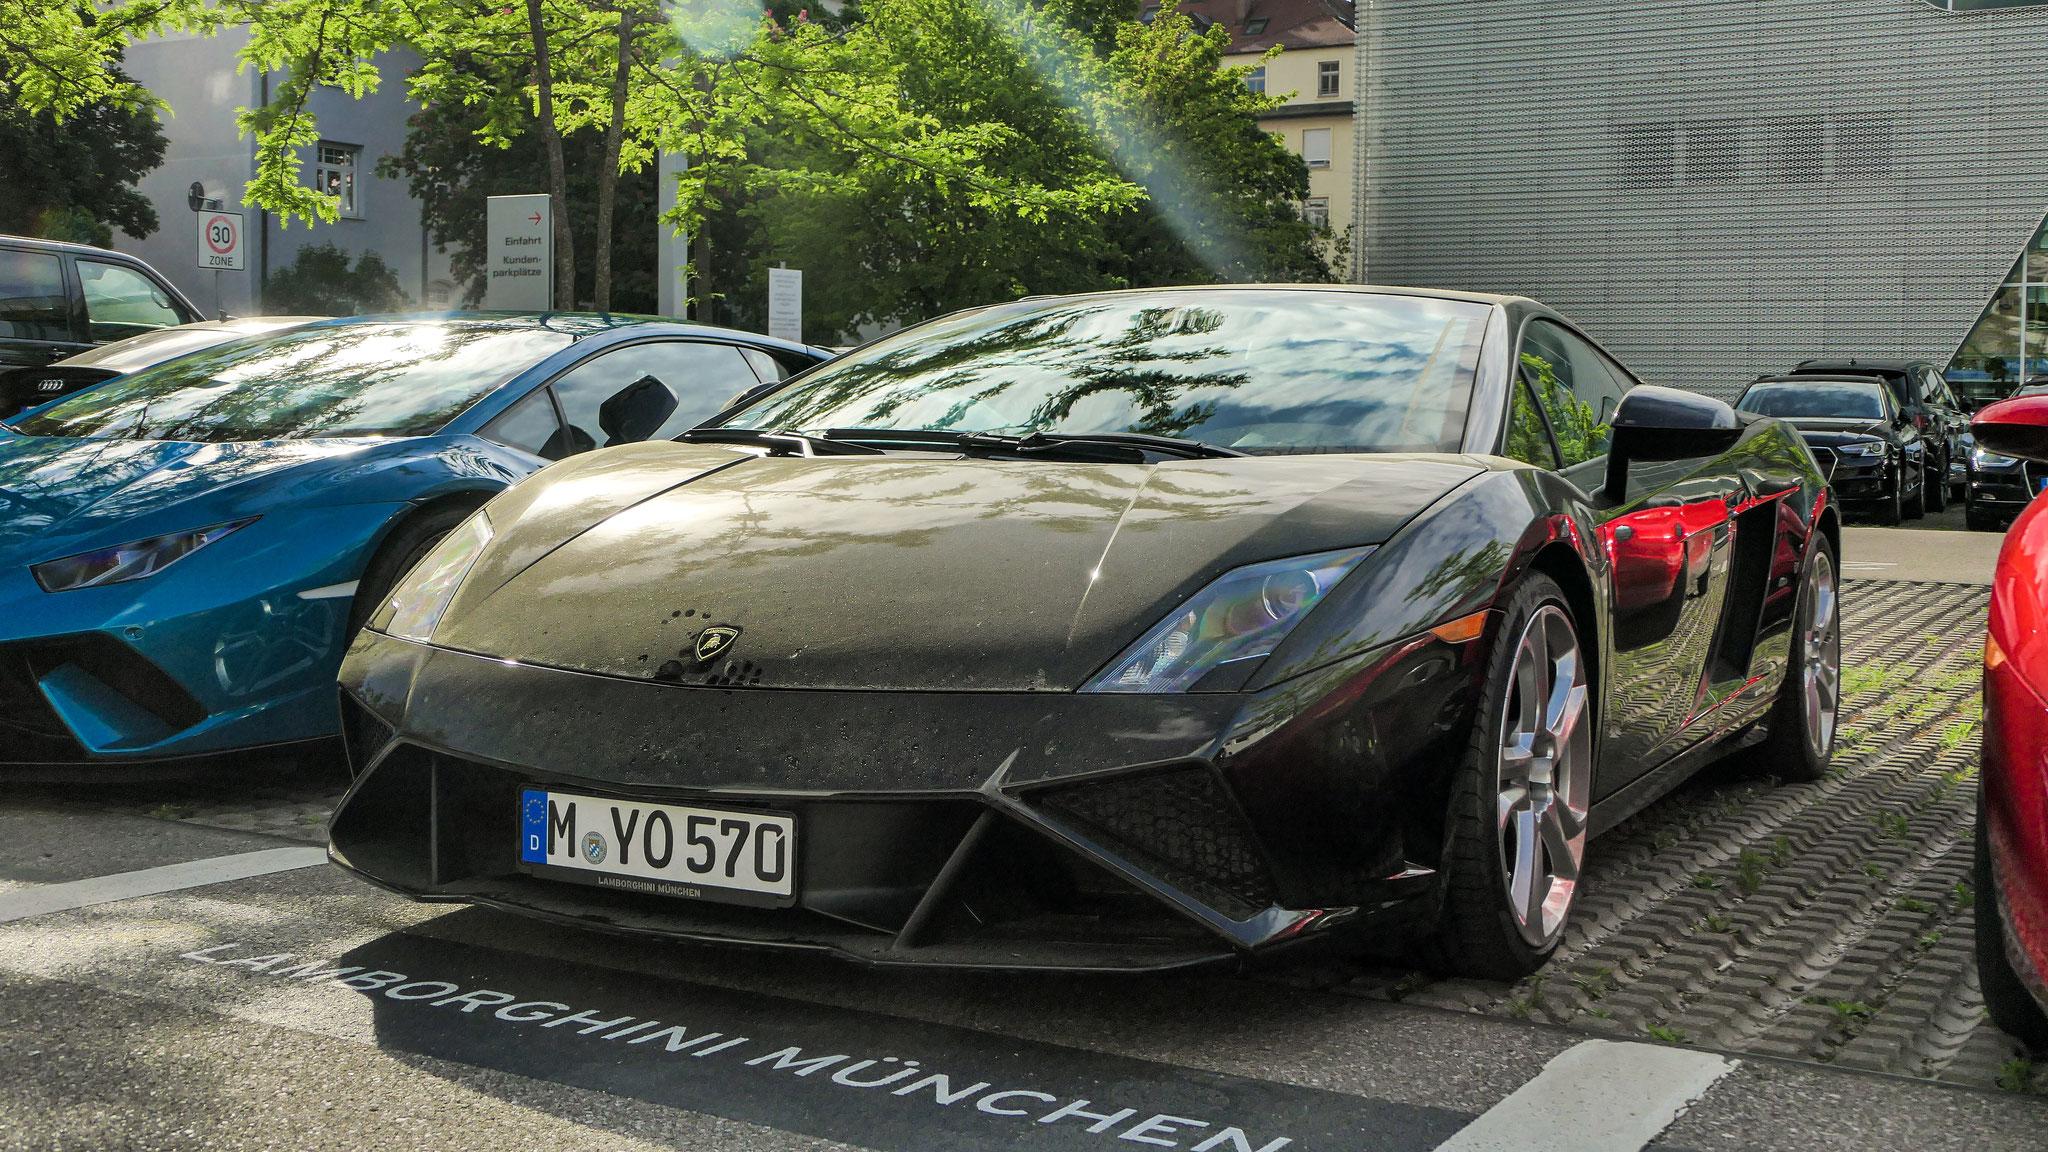 Lamborghini Gallardo LP 560 - M-YO-570